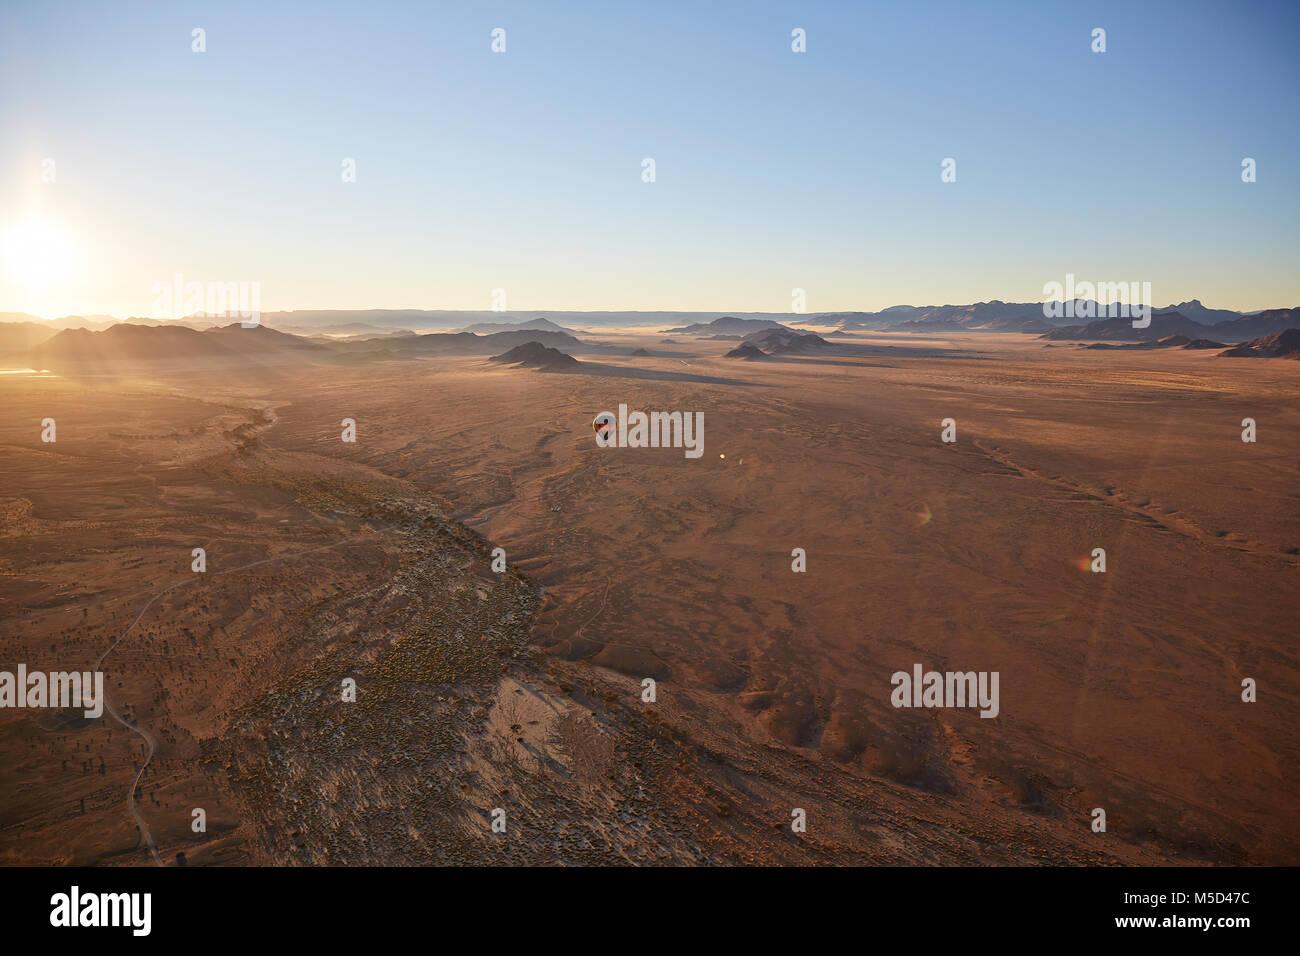 Aerial photo, view from hot air balloon, Tsaris mountains, Kulala Wilderness Reserve, Namib Desert, Hardap Region, - Stock Image